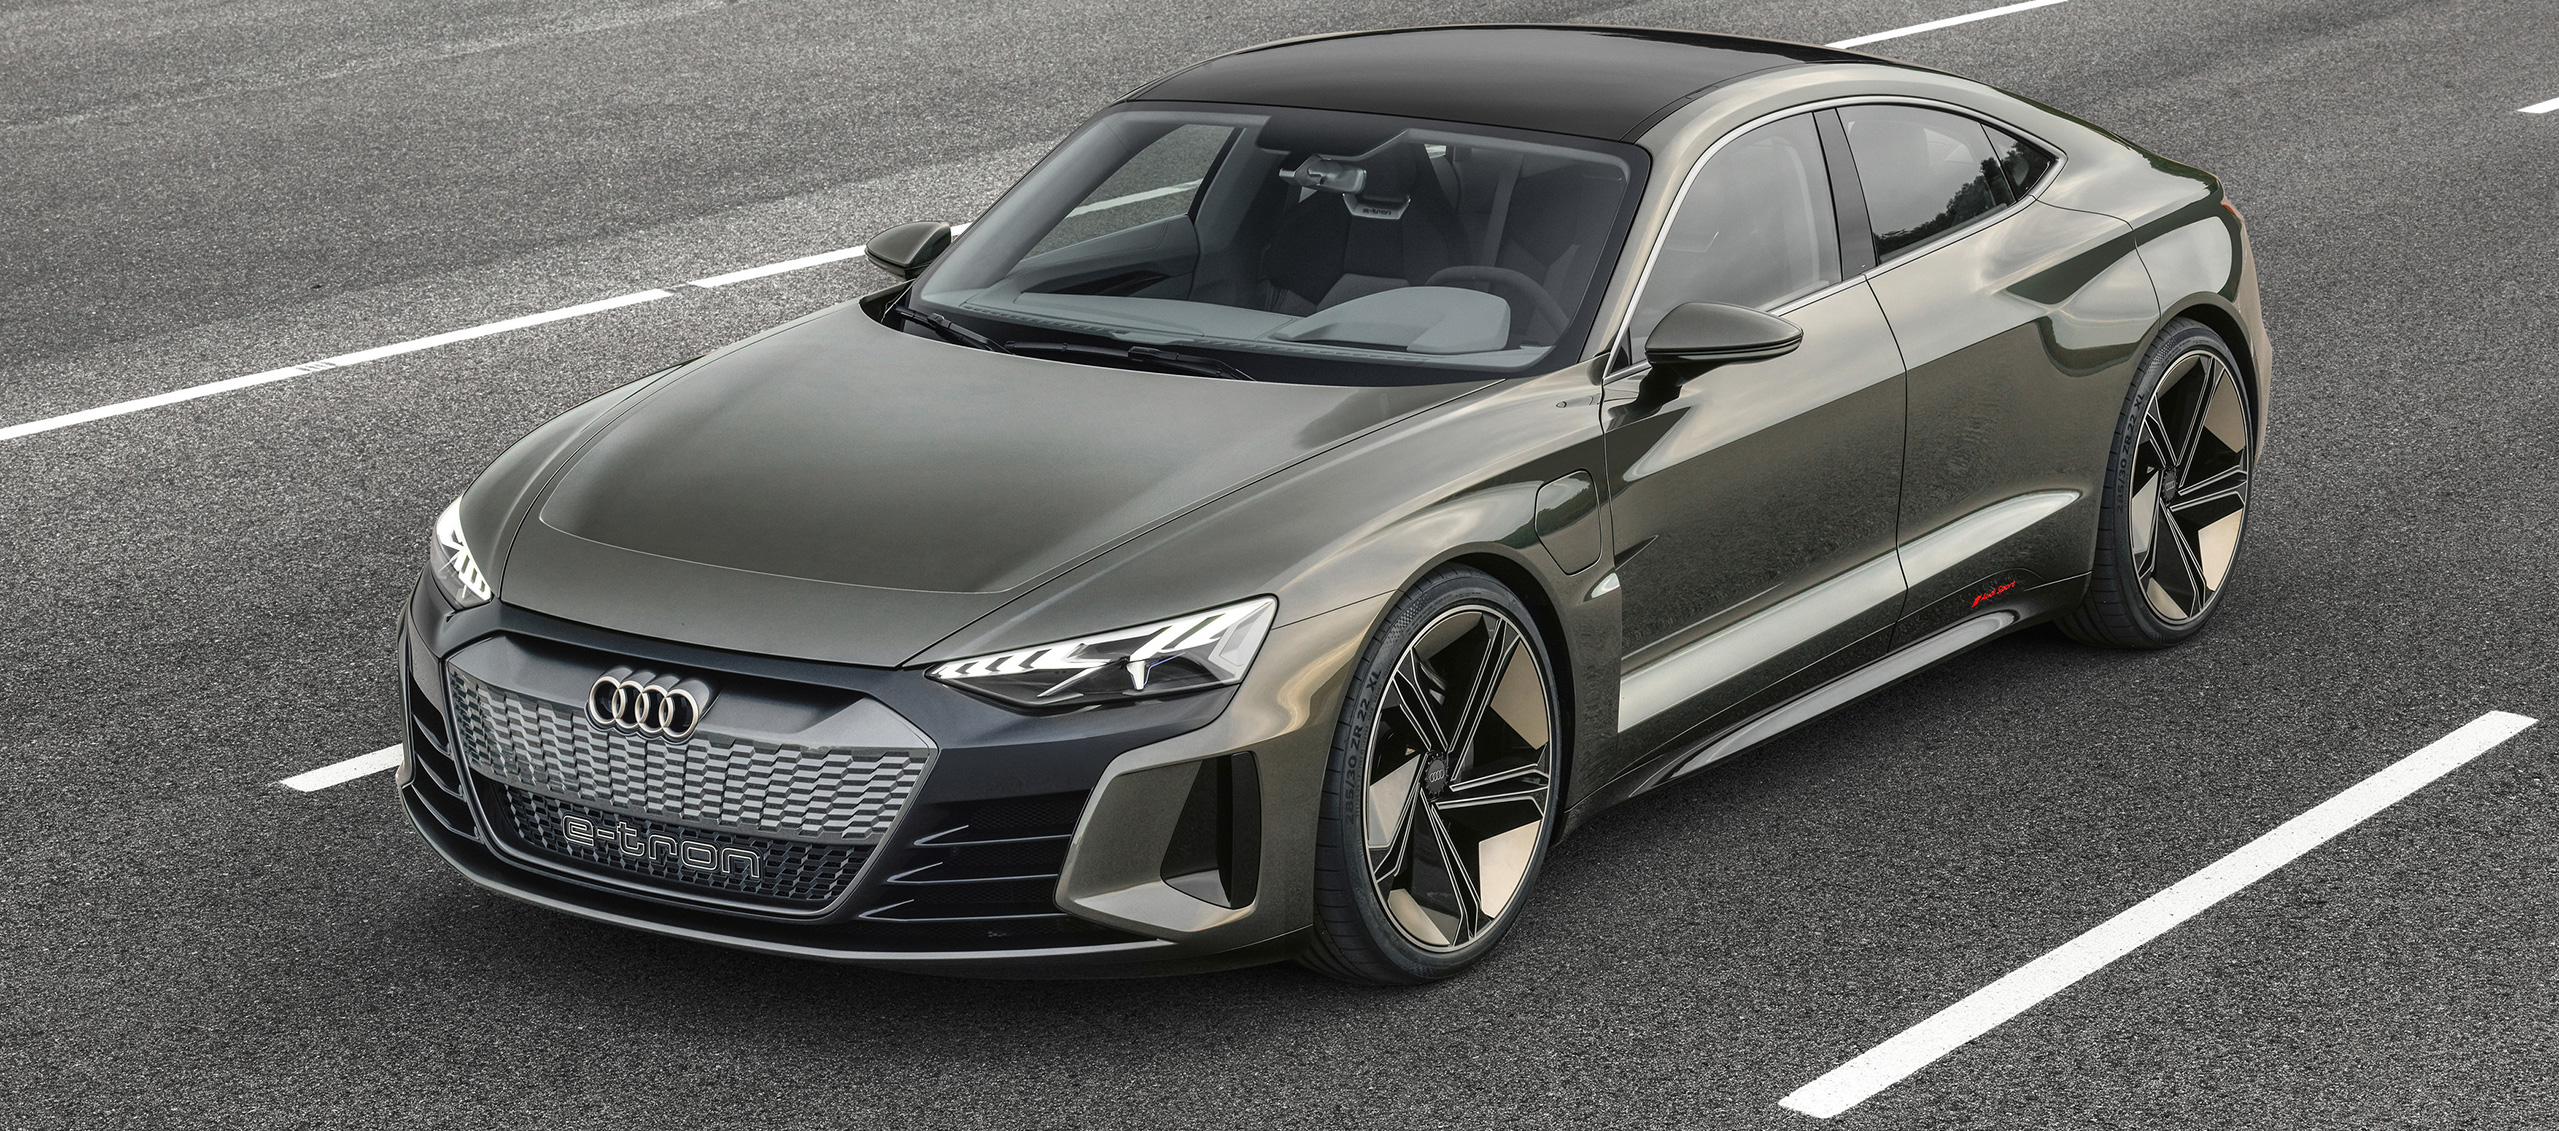 Audi e-tron GT concept eléctrico, un coupé de cuatro puertas